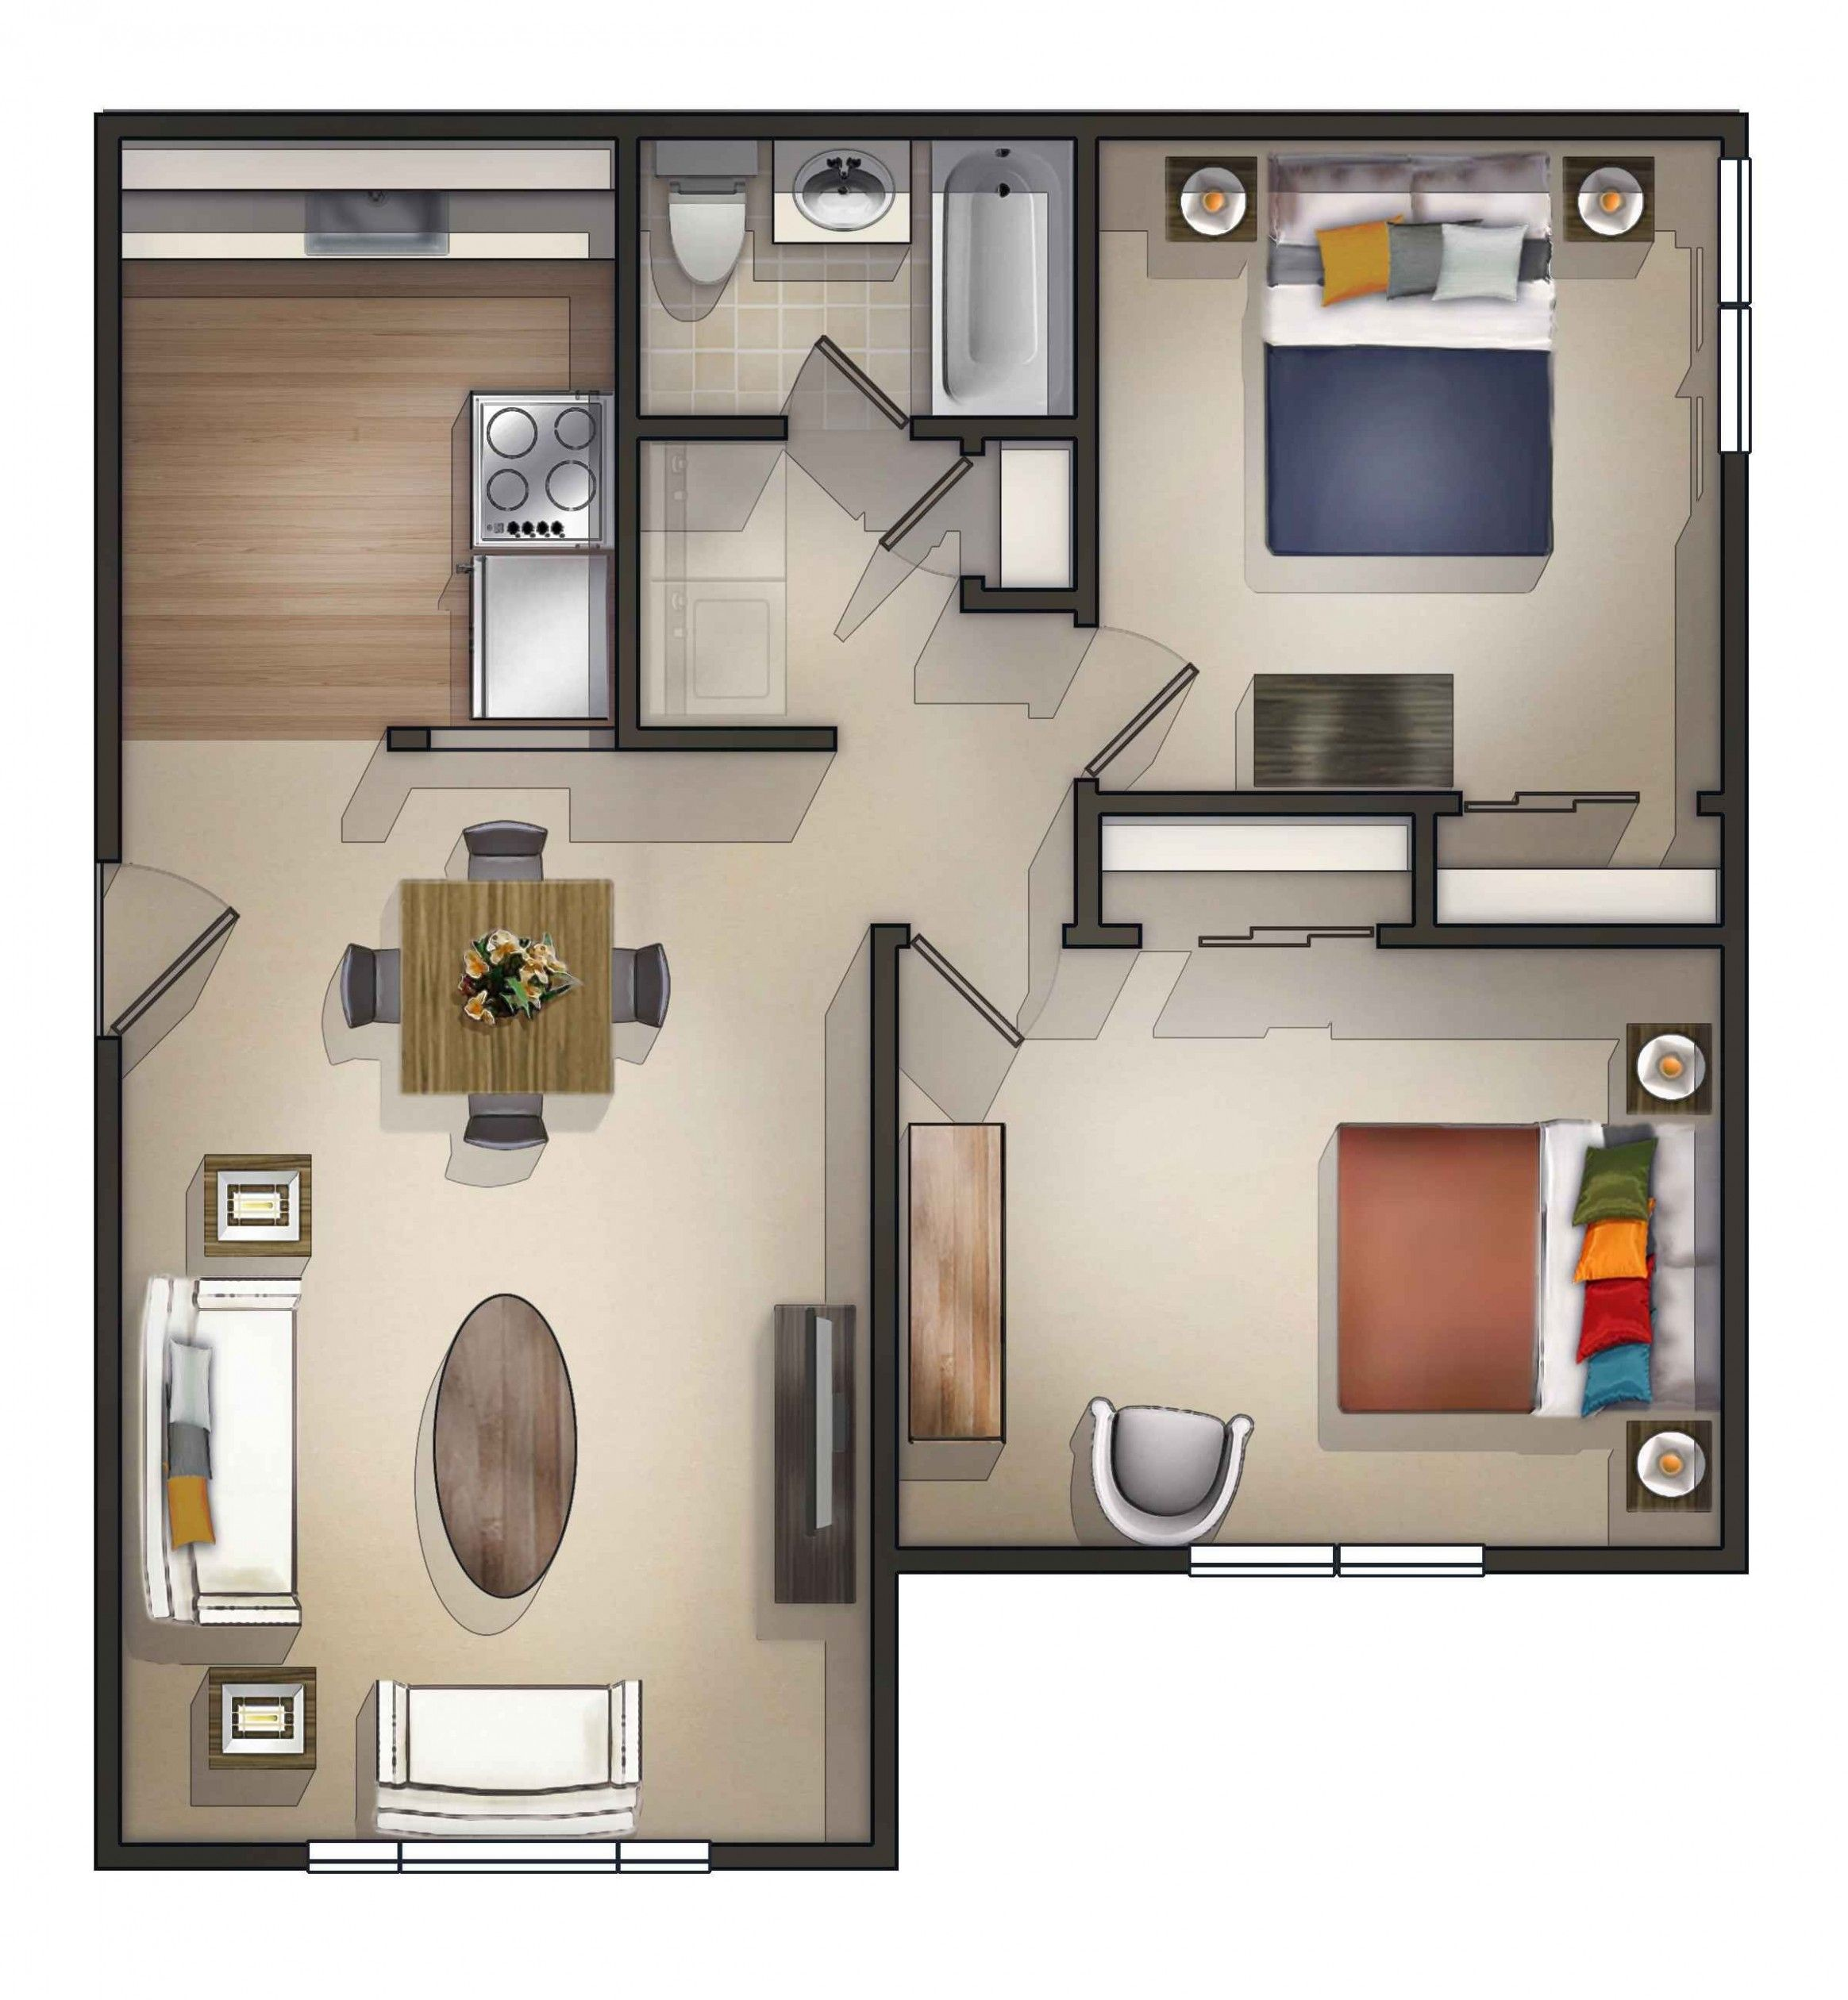 12 Quick Tips For One Bedroom Apartment Floor Plan Ideas Projetos De Casas Simples Casas Pequenas E Simples Apartamento Moderno